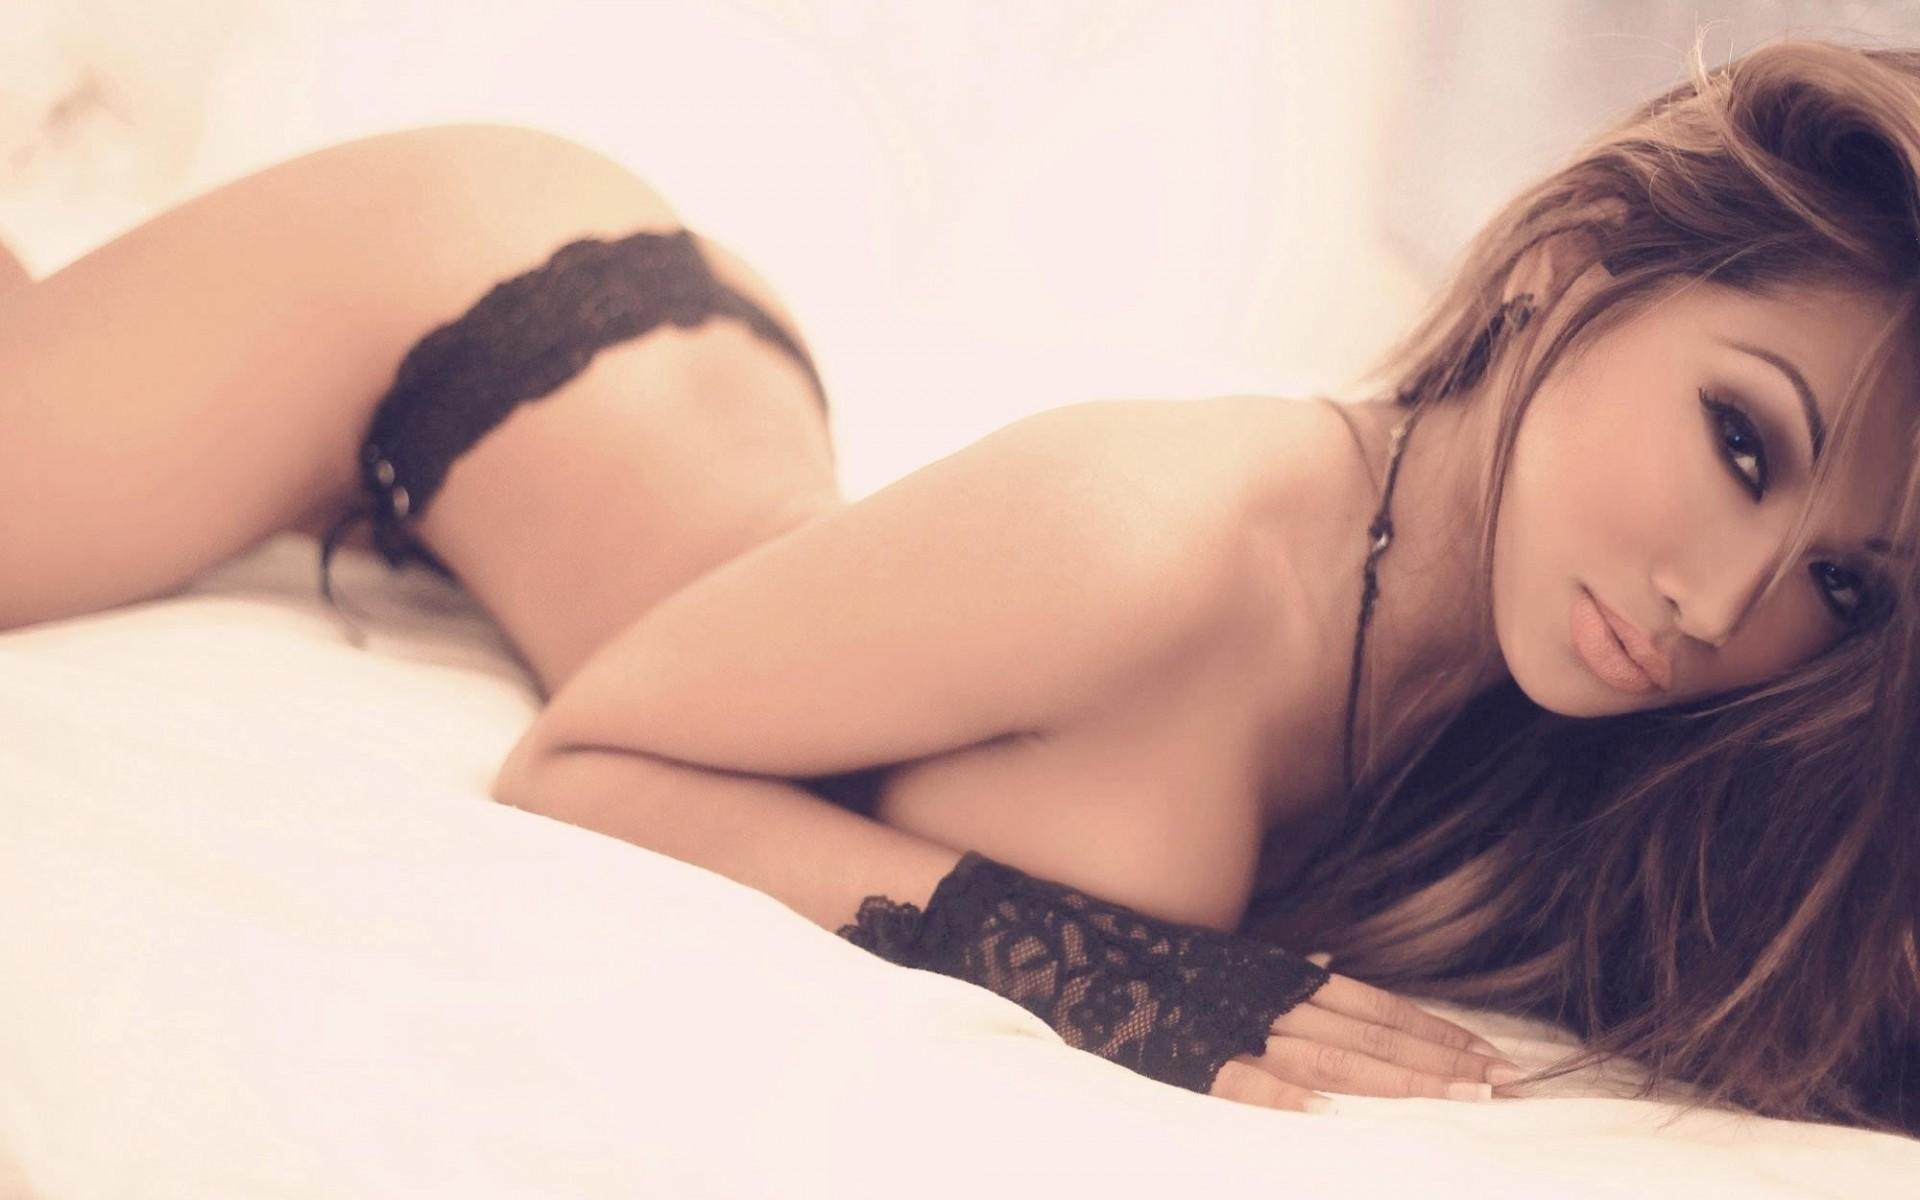 from Santos black hair girl topless